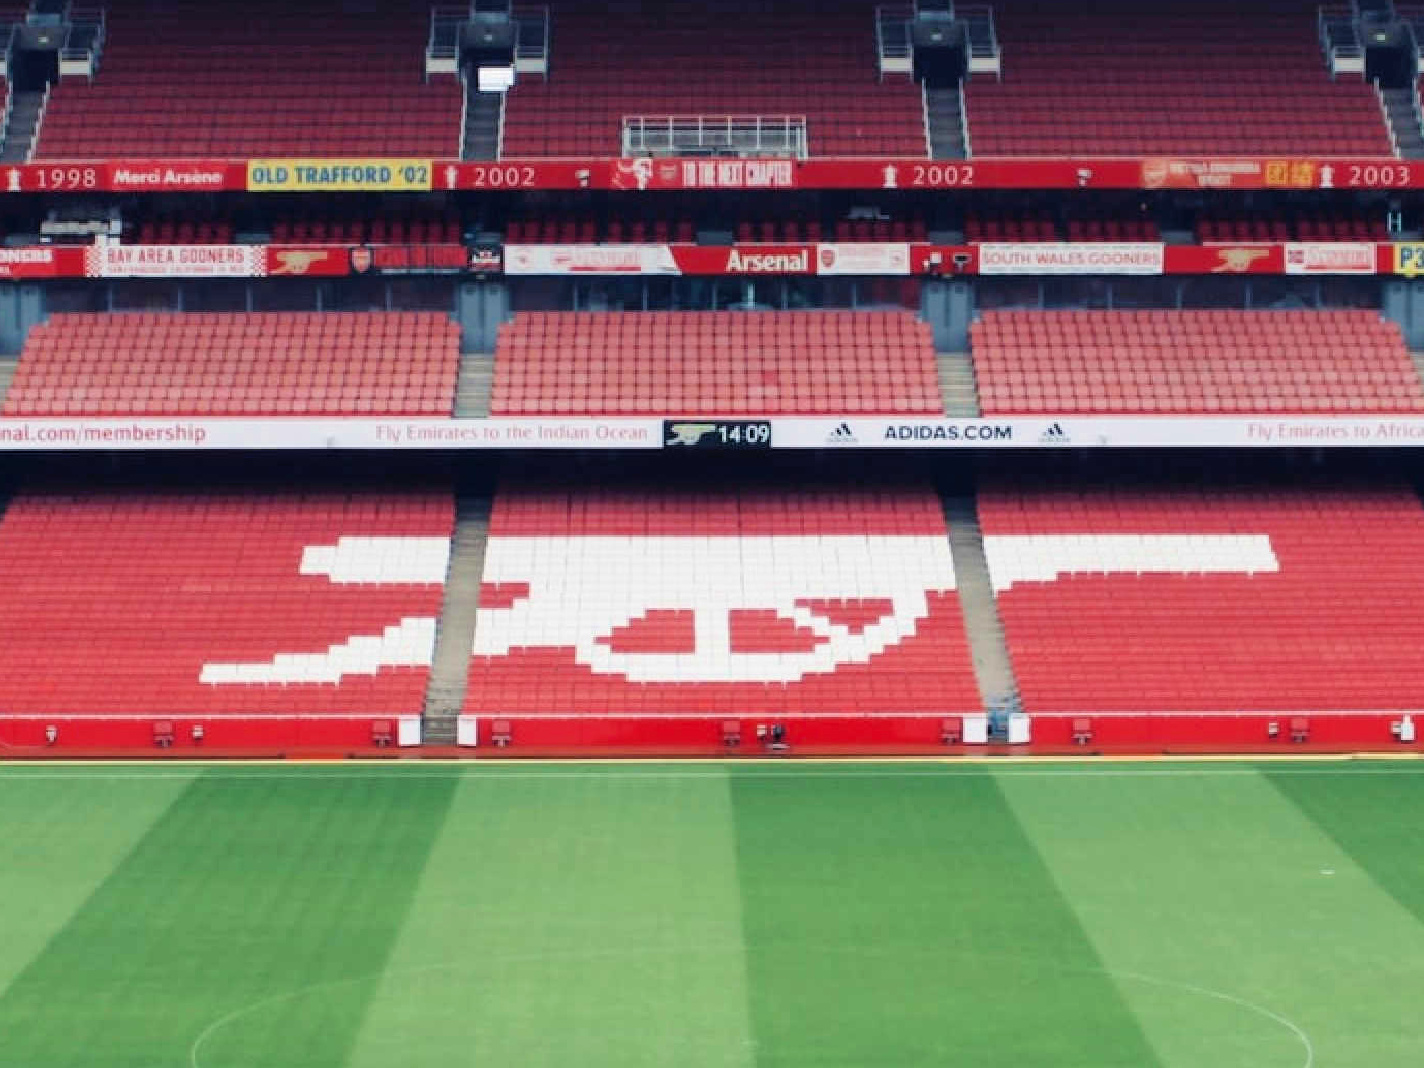 Arsenal's home ground - The Emirates Stadium